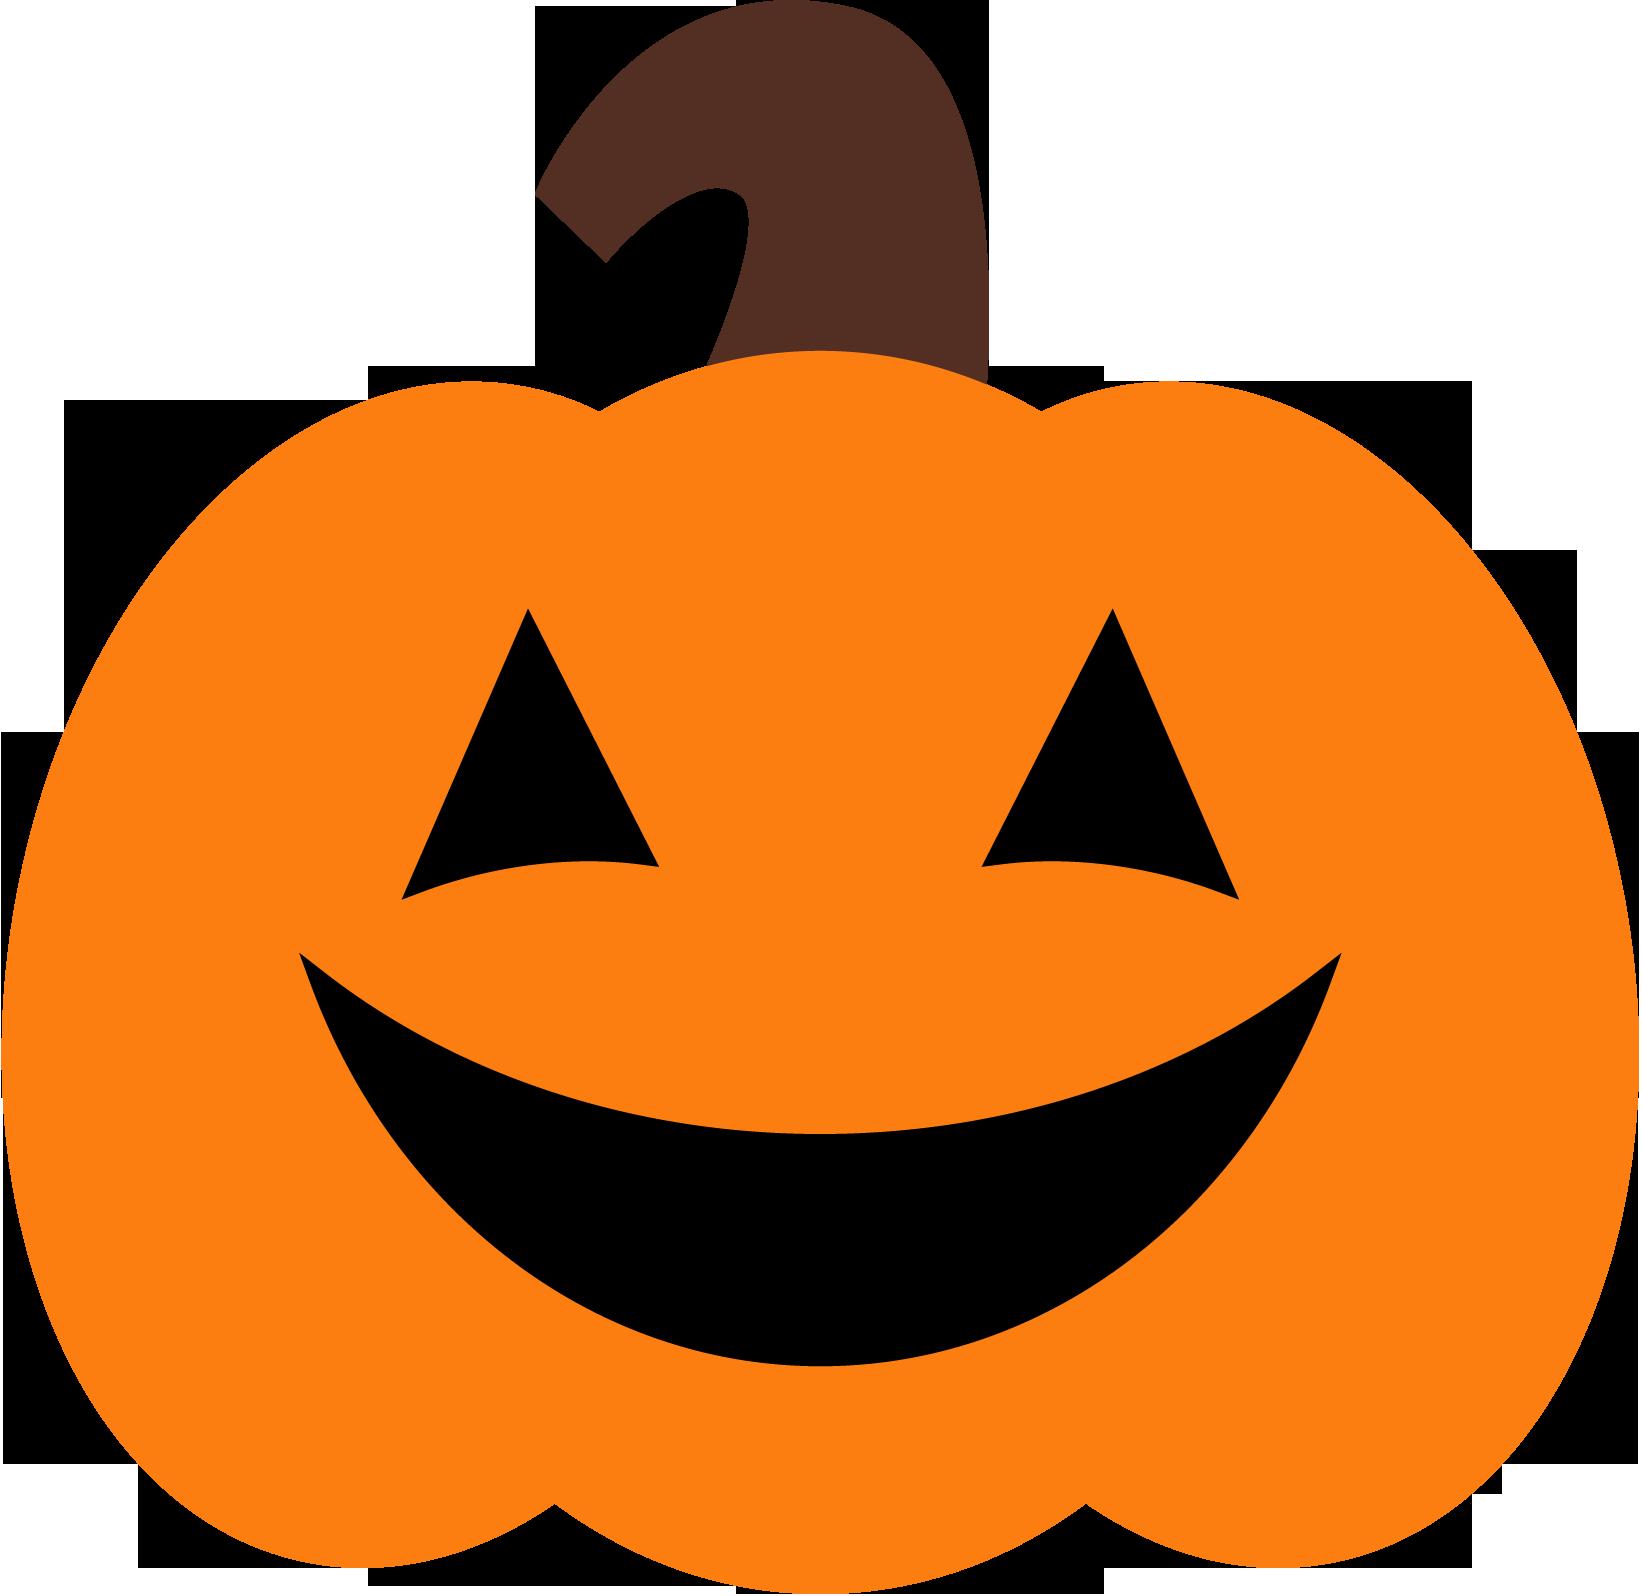 Clipart halloween transparent background. Free clipartix